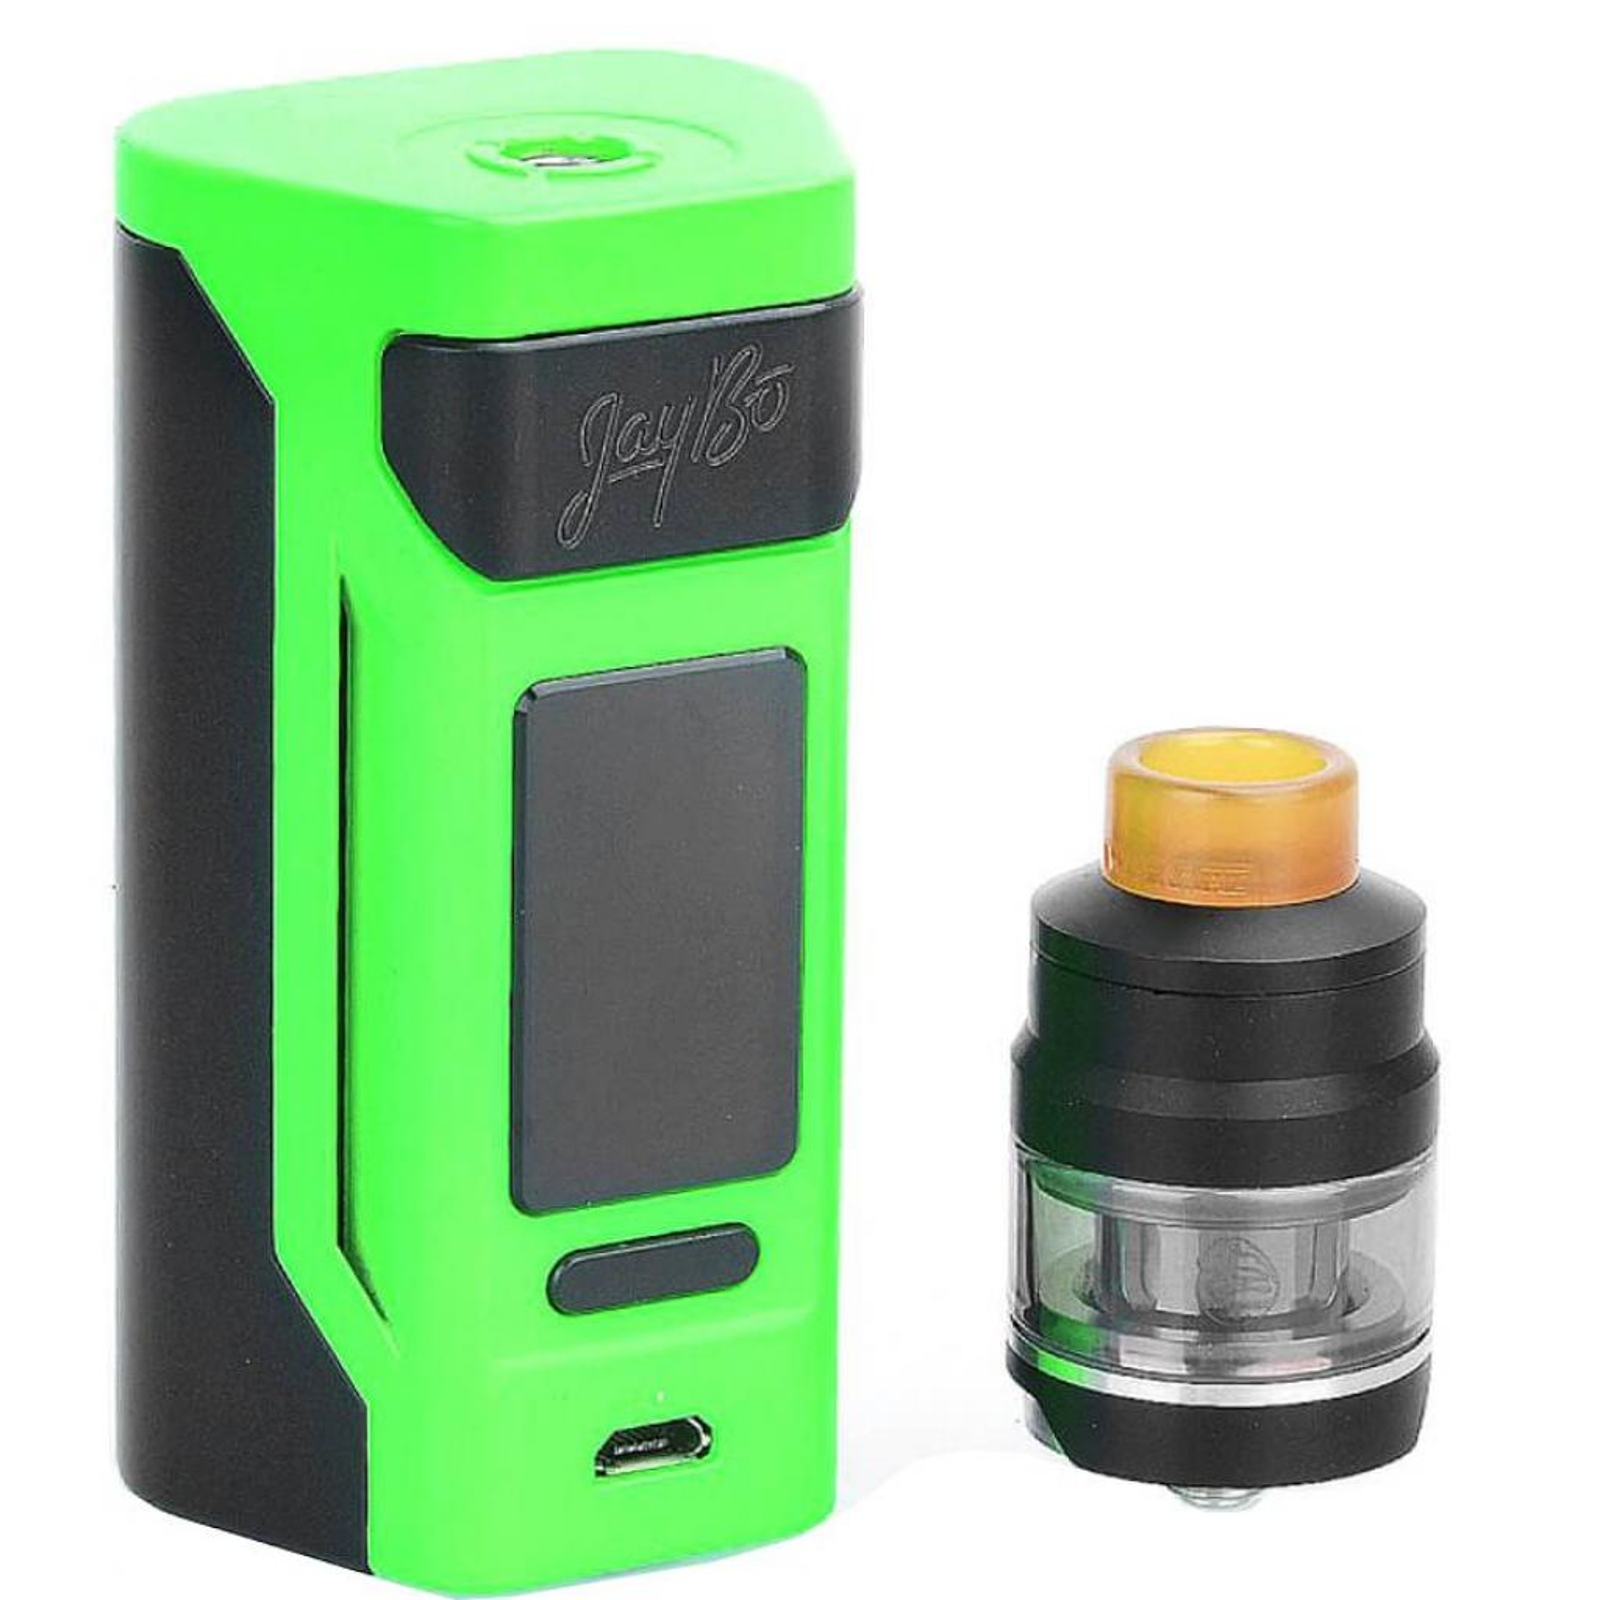 Стартовый набор Wismec Reuleaux RX2 20700 with Gnome Tank Kit Green (WISRX2KGR) изображение 3